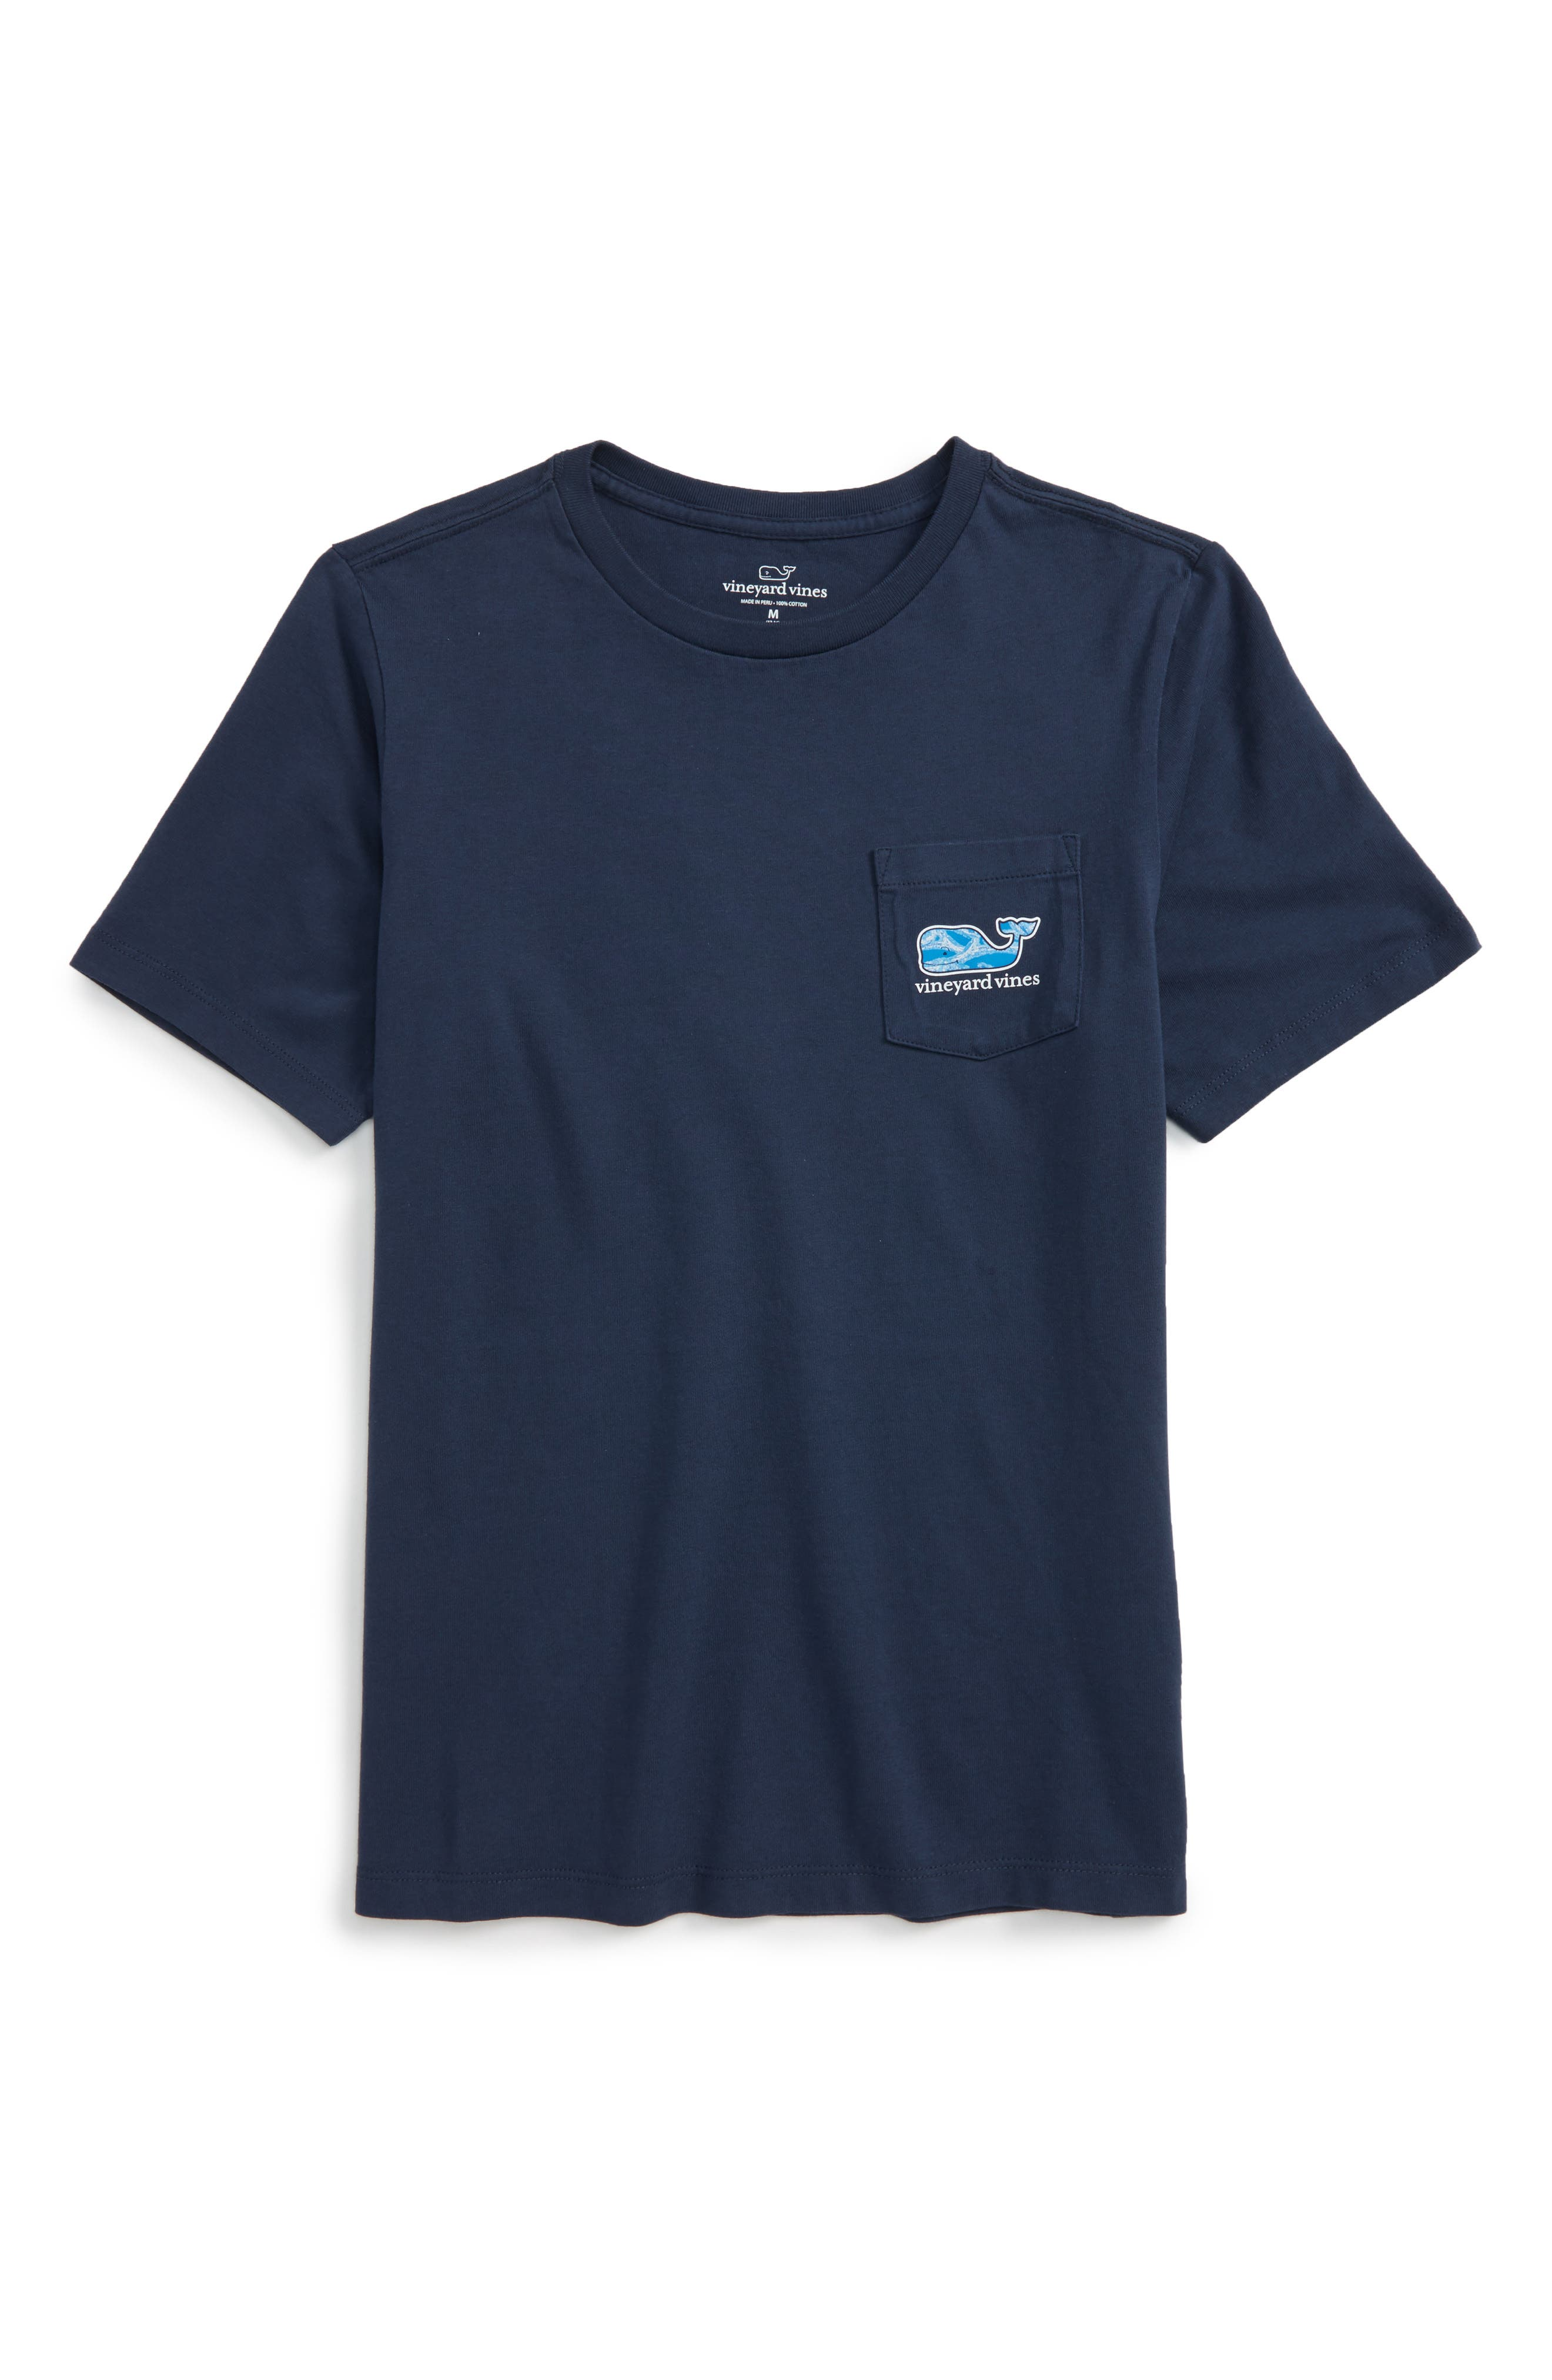 Vineyard Vines Marlin Whale Pocket T-Shirt (Toddler Boys, Little Boys & Big Boys)